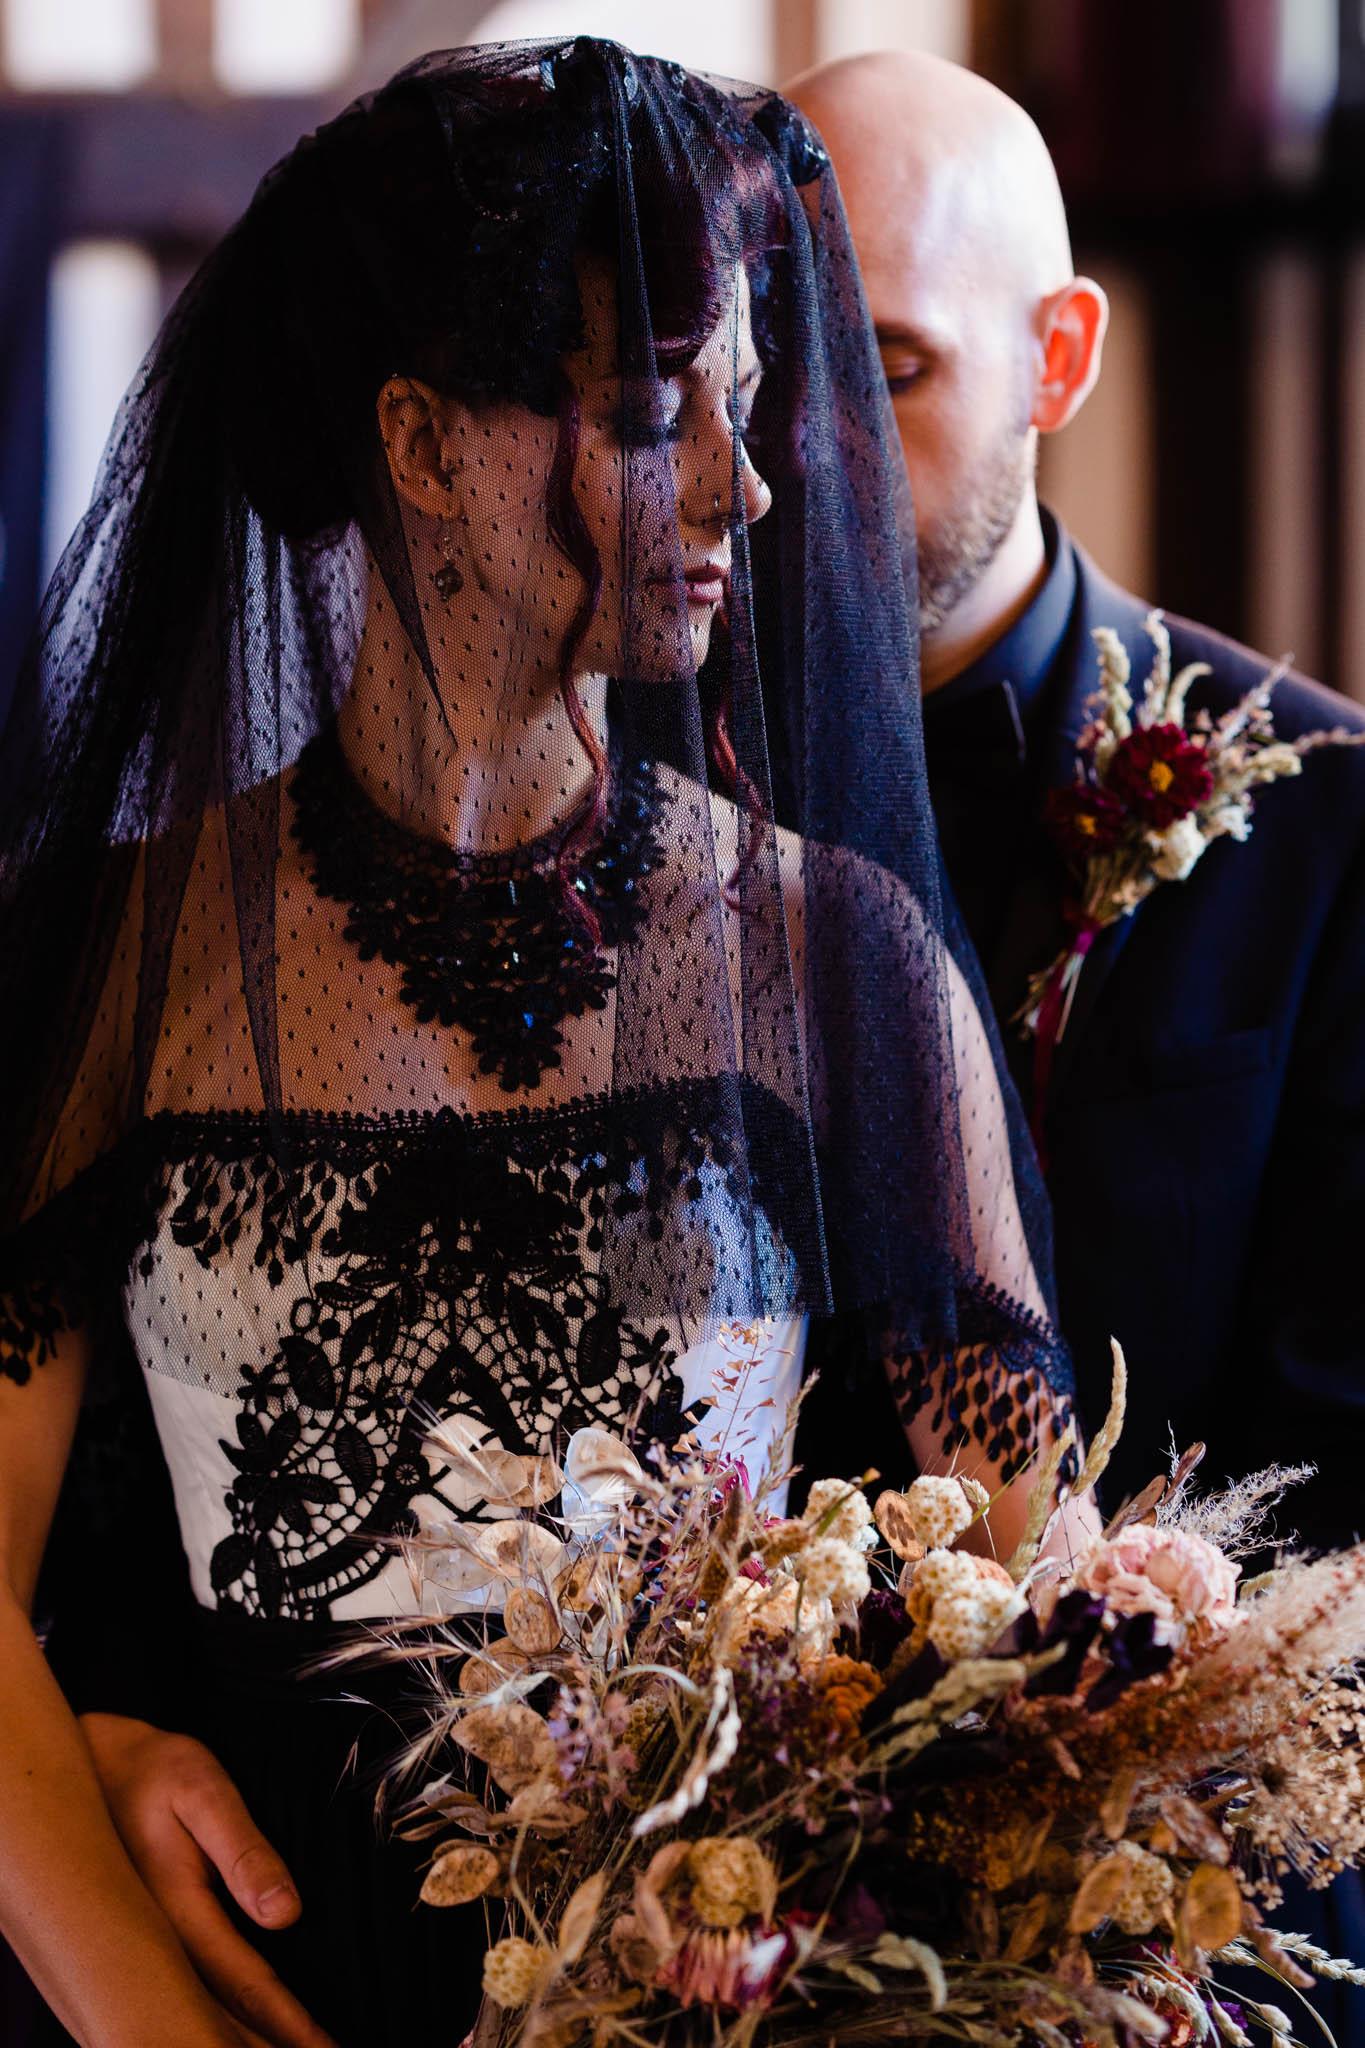 gothic bride with black veil - gothic bridal veil - black veil - black wedding dress - alternative wedding dress